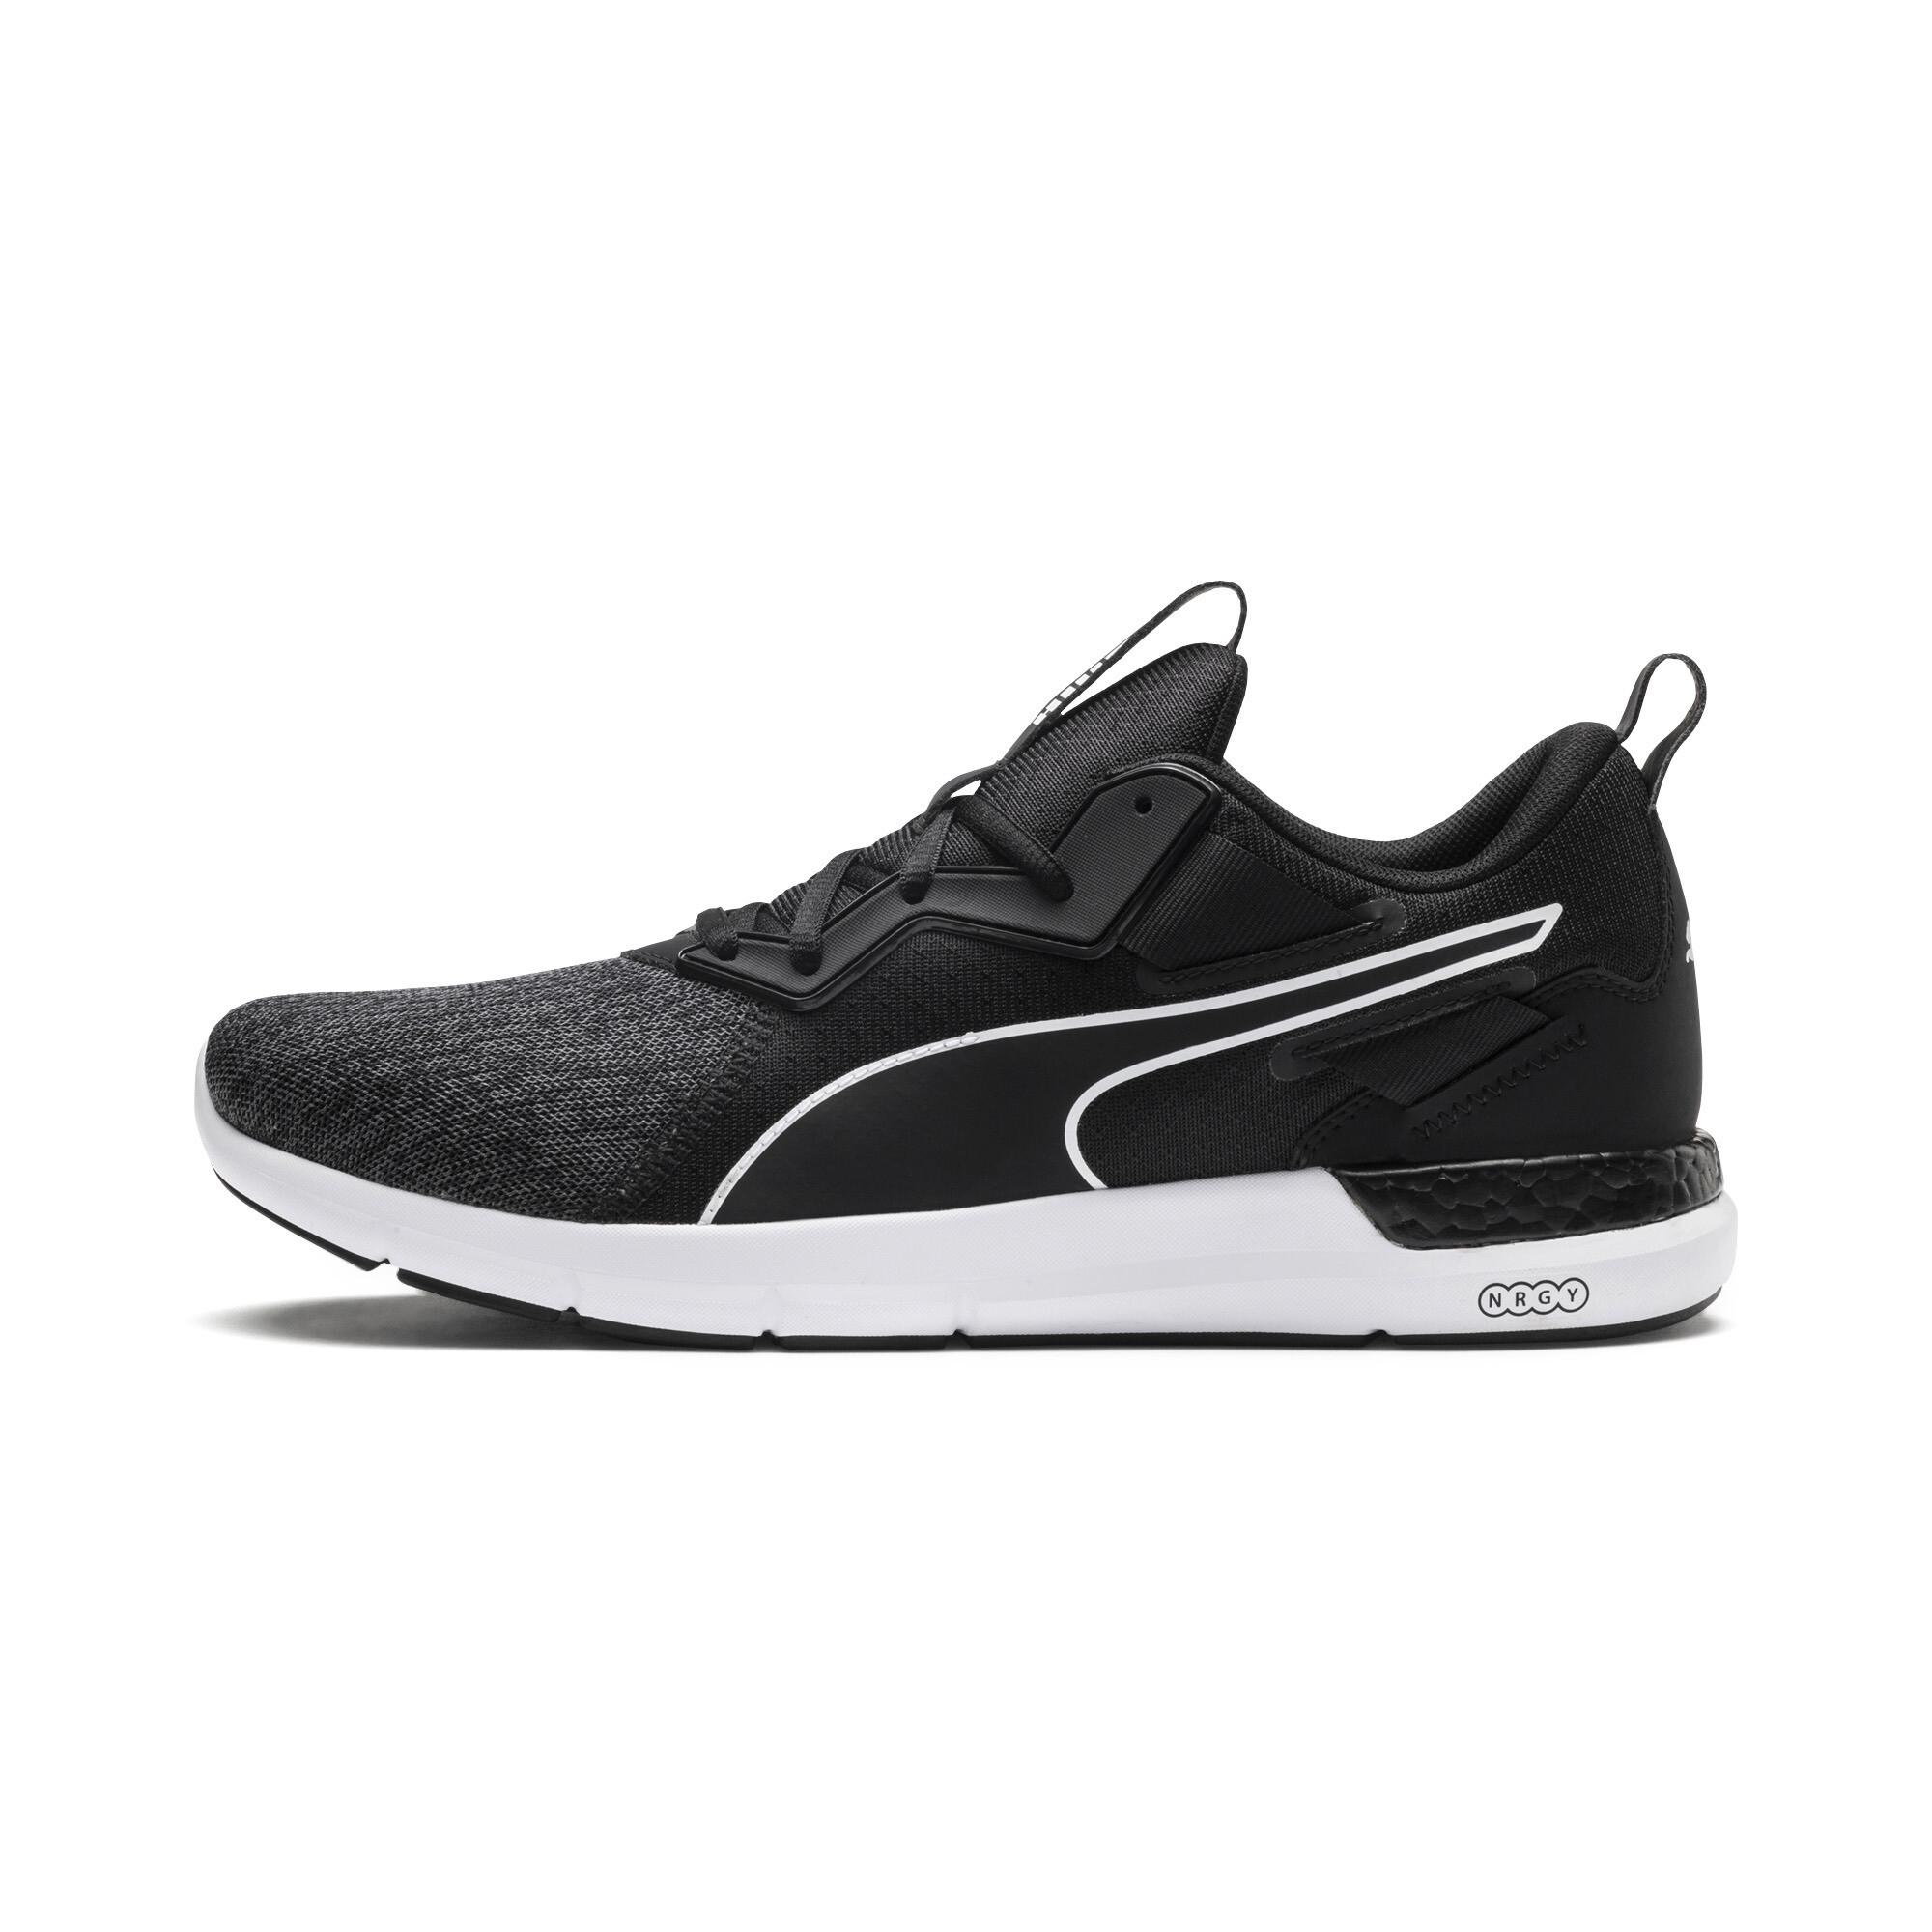 PUMA-NRGY-Dynamo-Futuro-Men-039-s-Running-Shoes-Men-Shoe-Running thumbnail 18